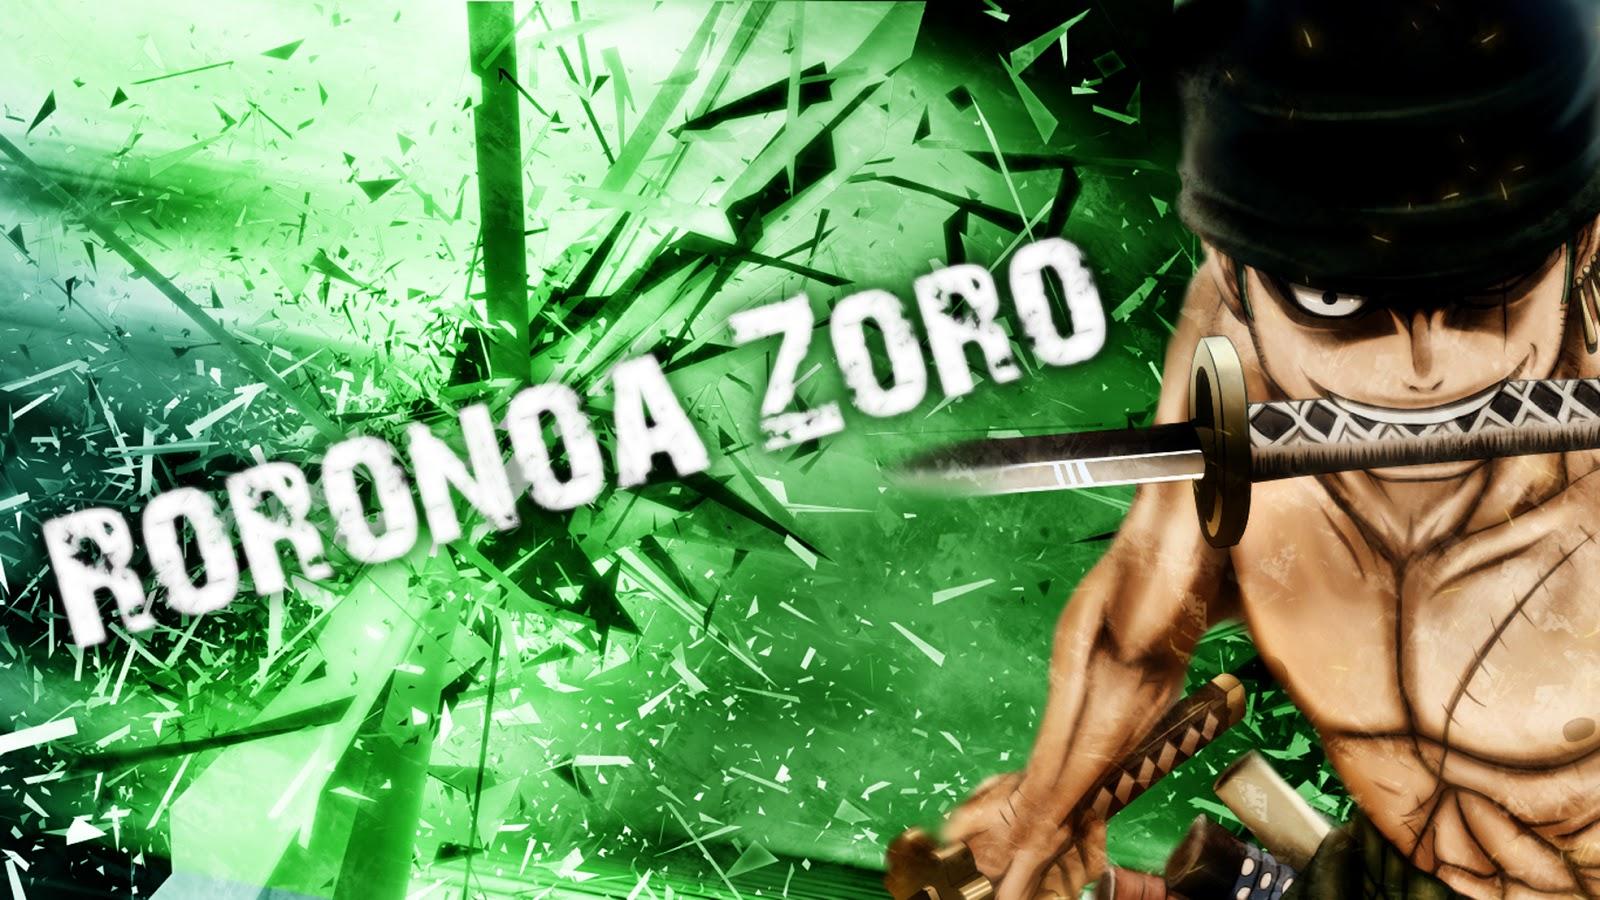 Roronoa Zoro Wallpaper Perfect Wallpaper 1600x900